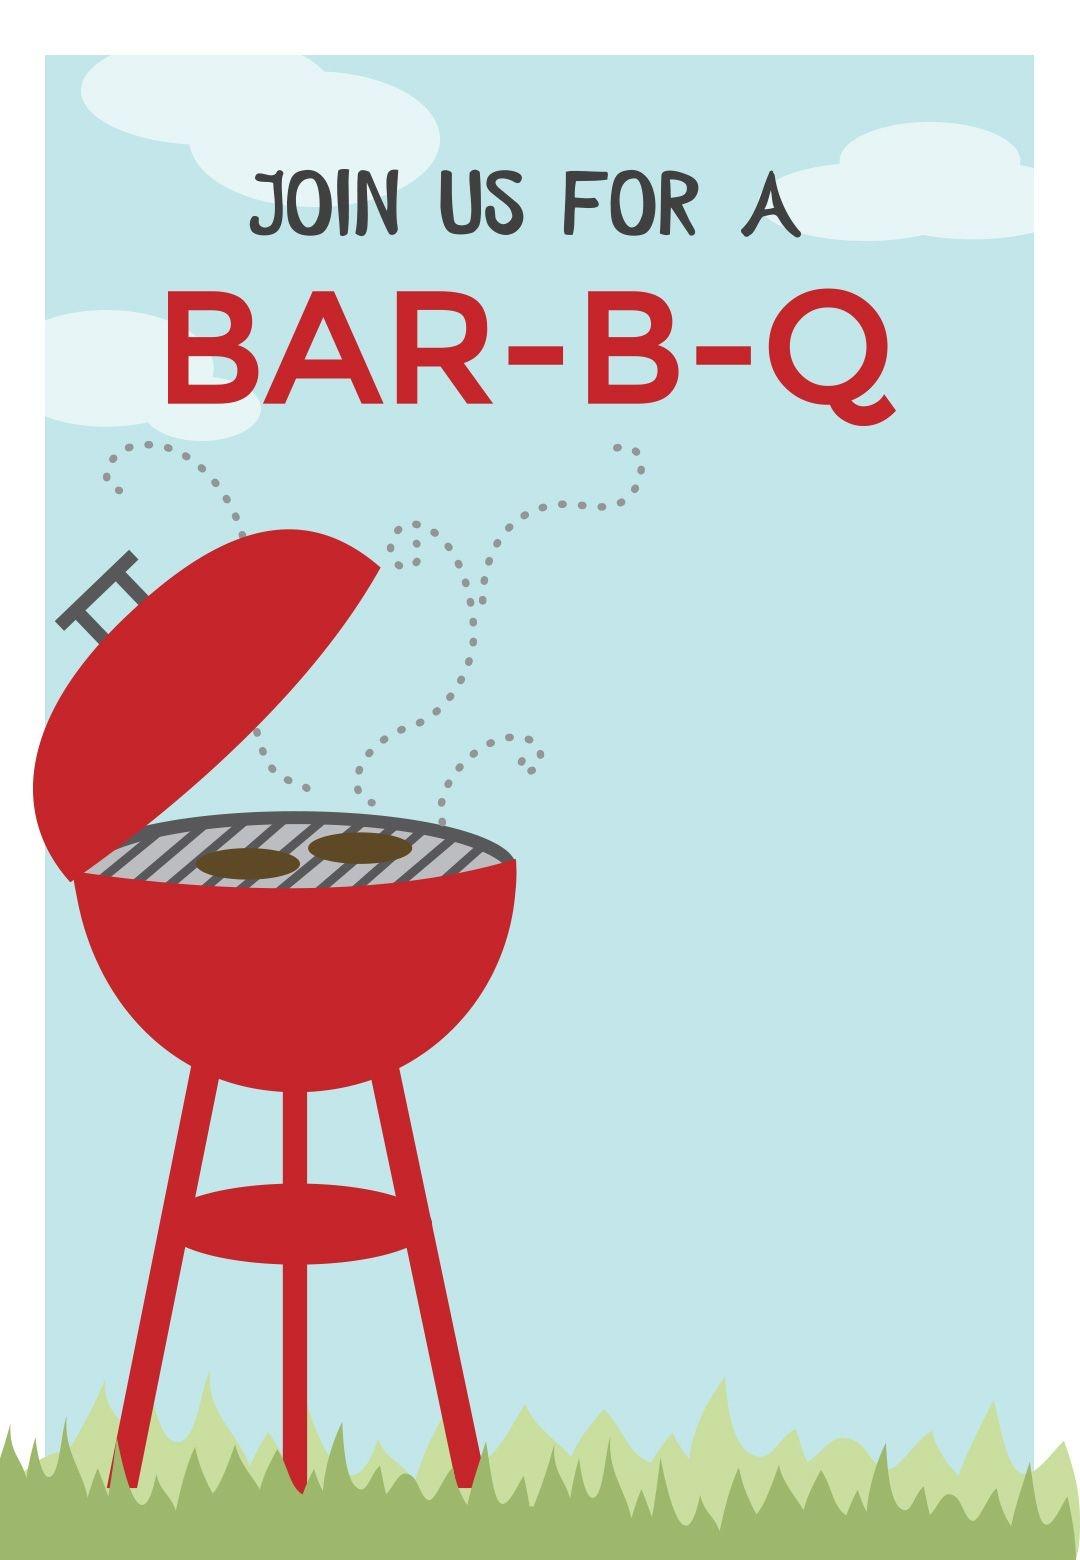 Free Printable Bbq Party Invitation - Bbq Cookout | Greetings Island - Free Printable Cookout Invitations